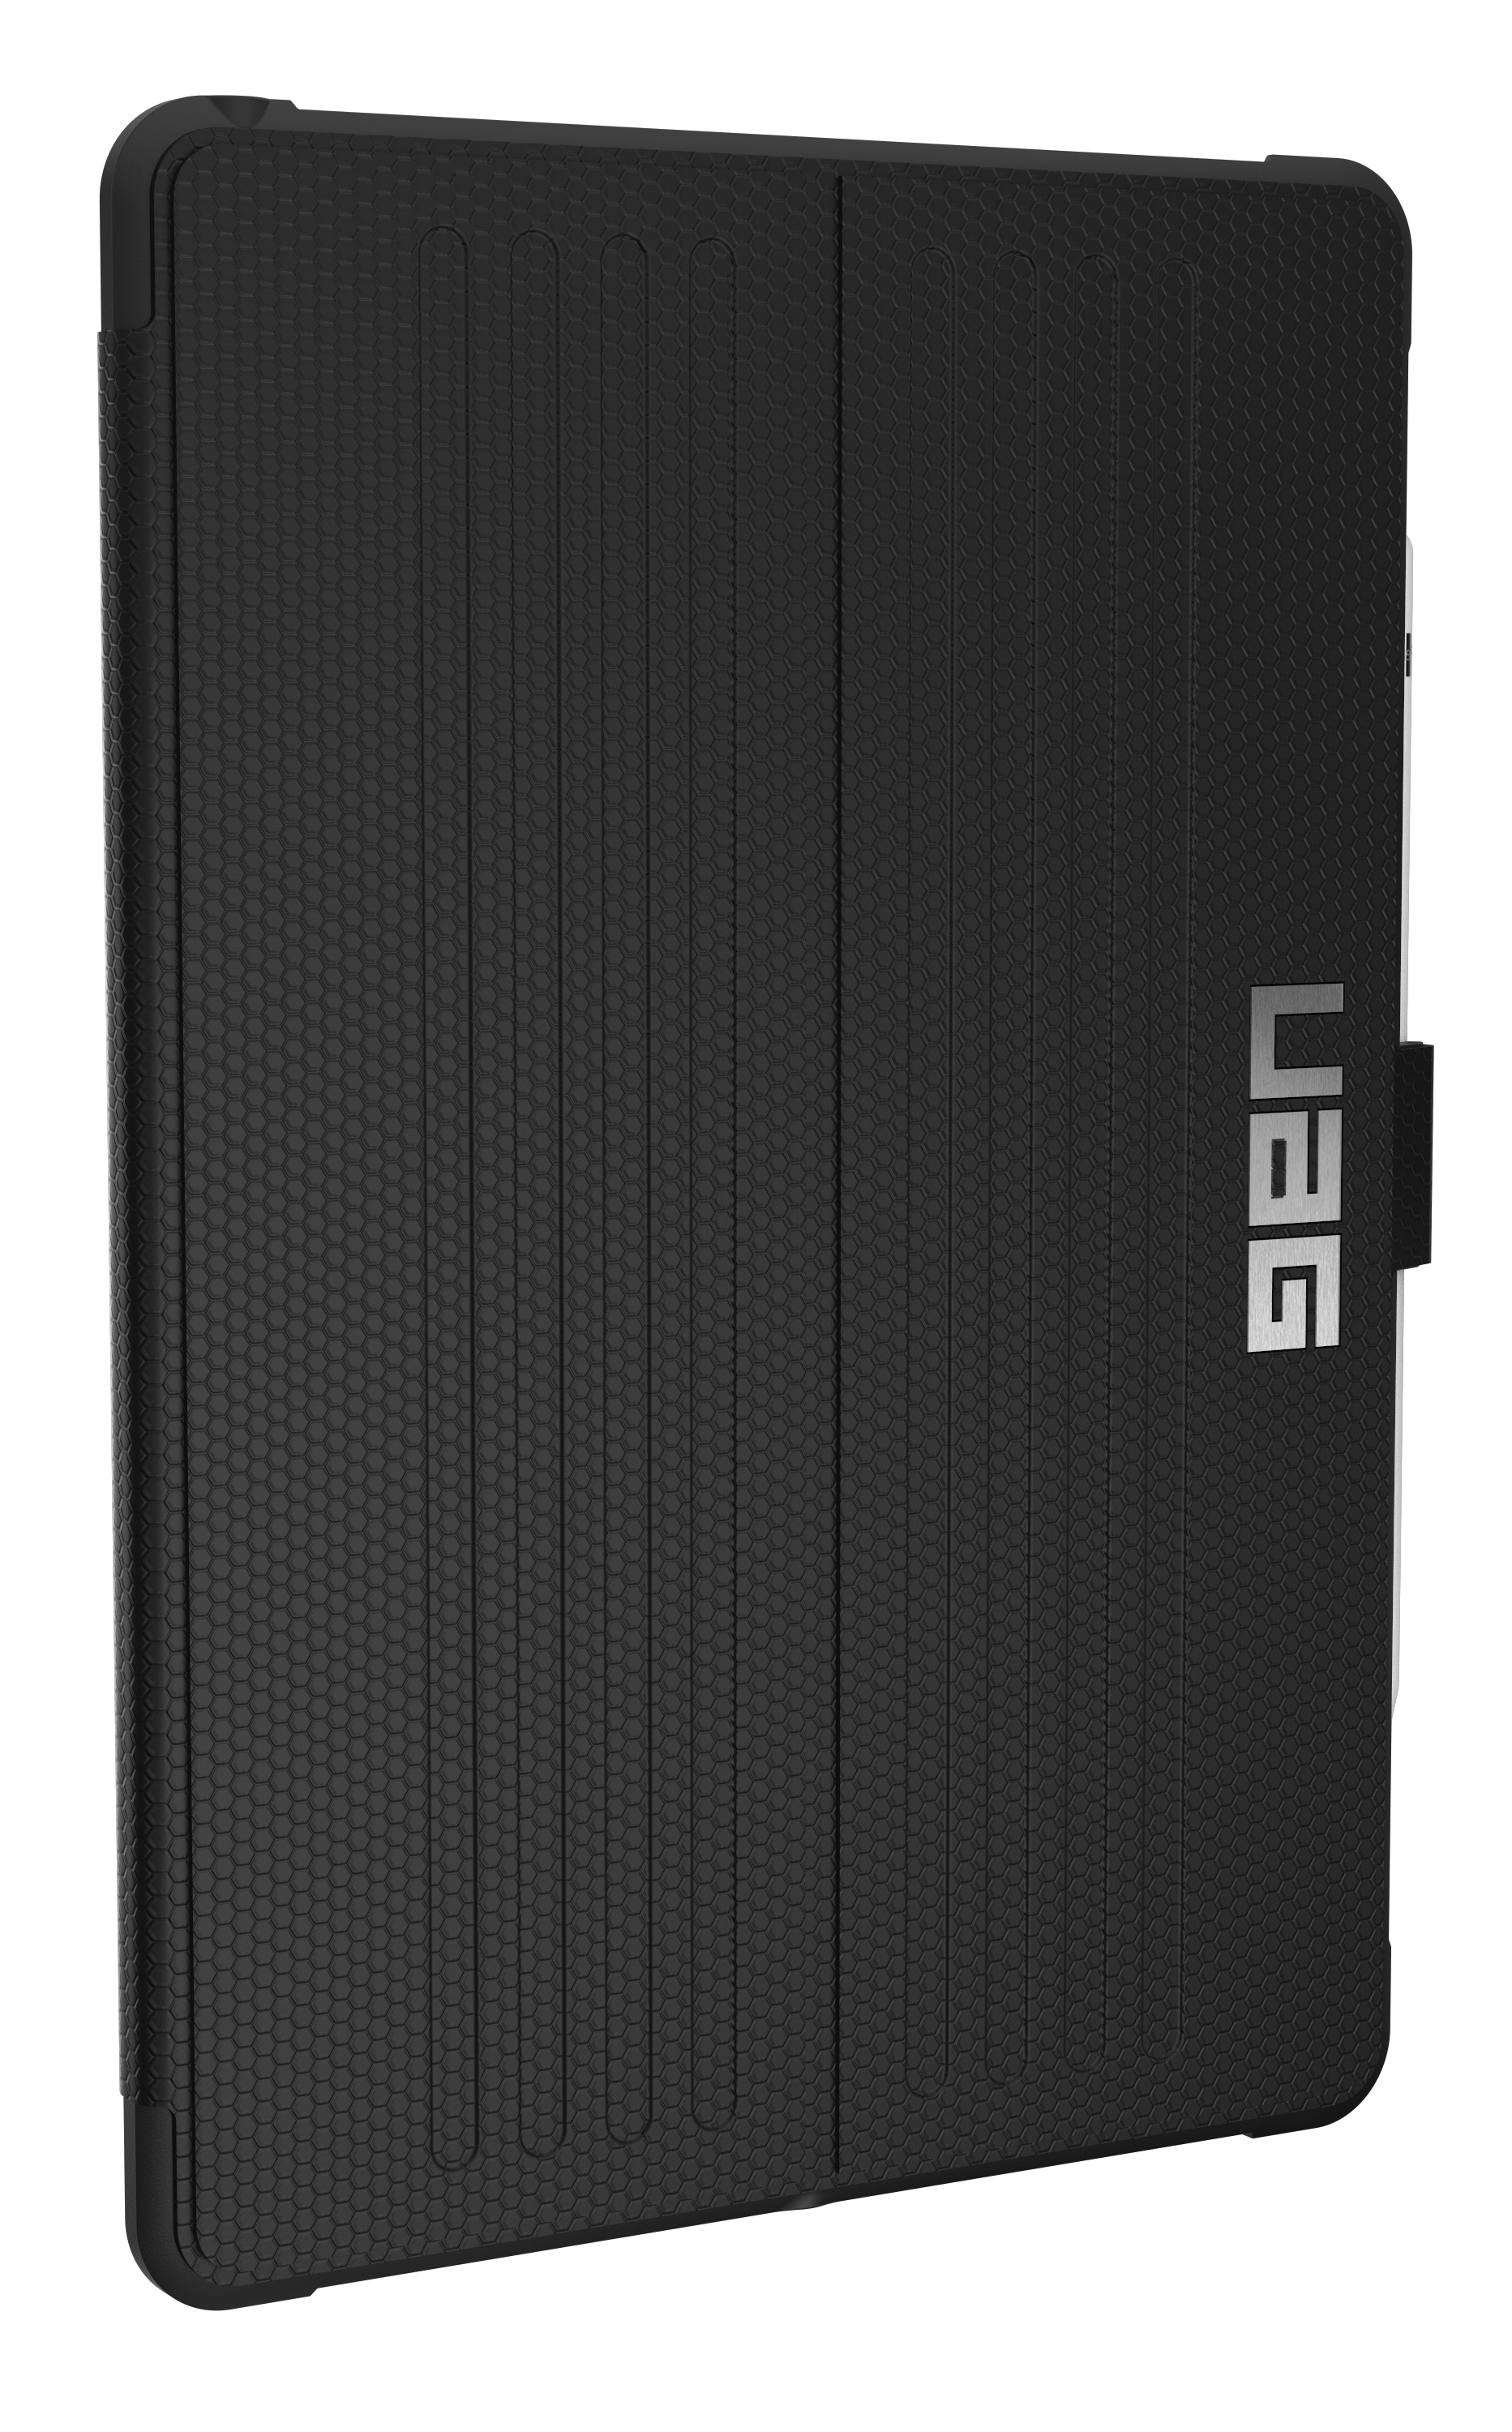 Urban Armor Gear Metropolis Case Black for iPad Pro 10.5 Inch